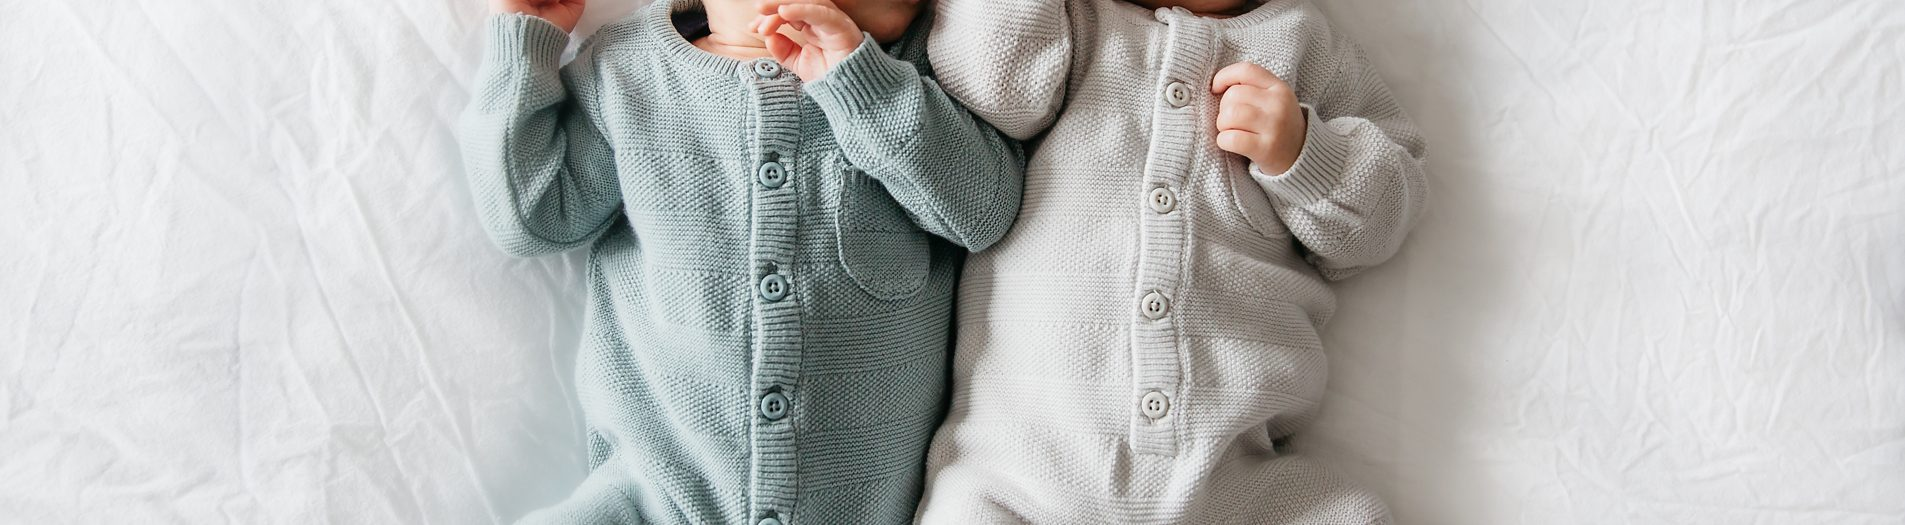 Newbornfotografie tweeling: MEET TWINS FELIX & SEBAS